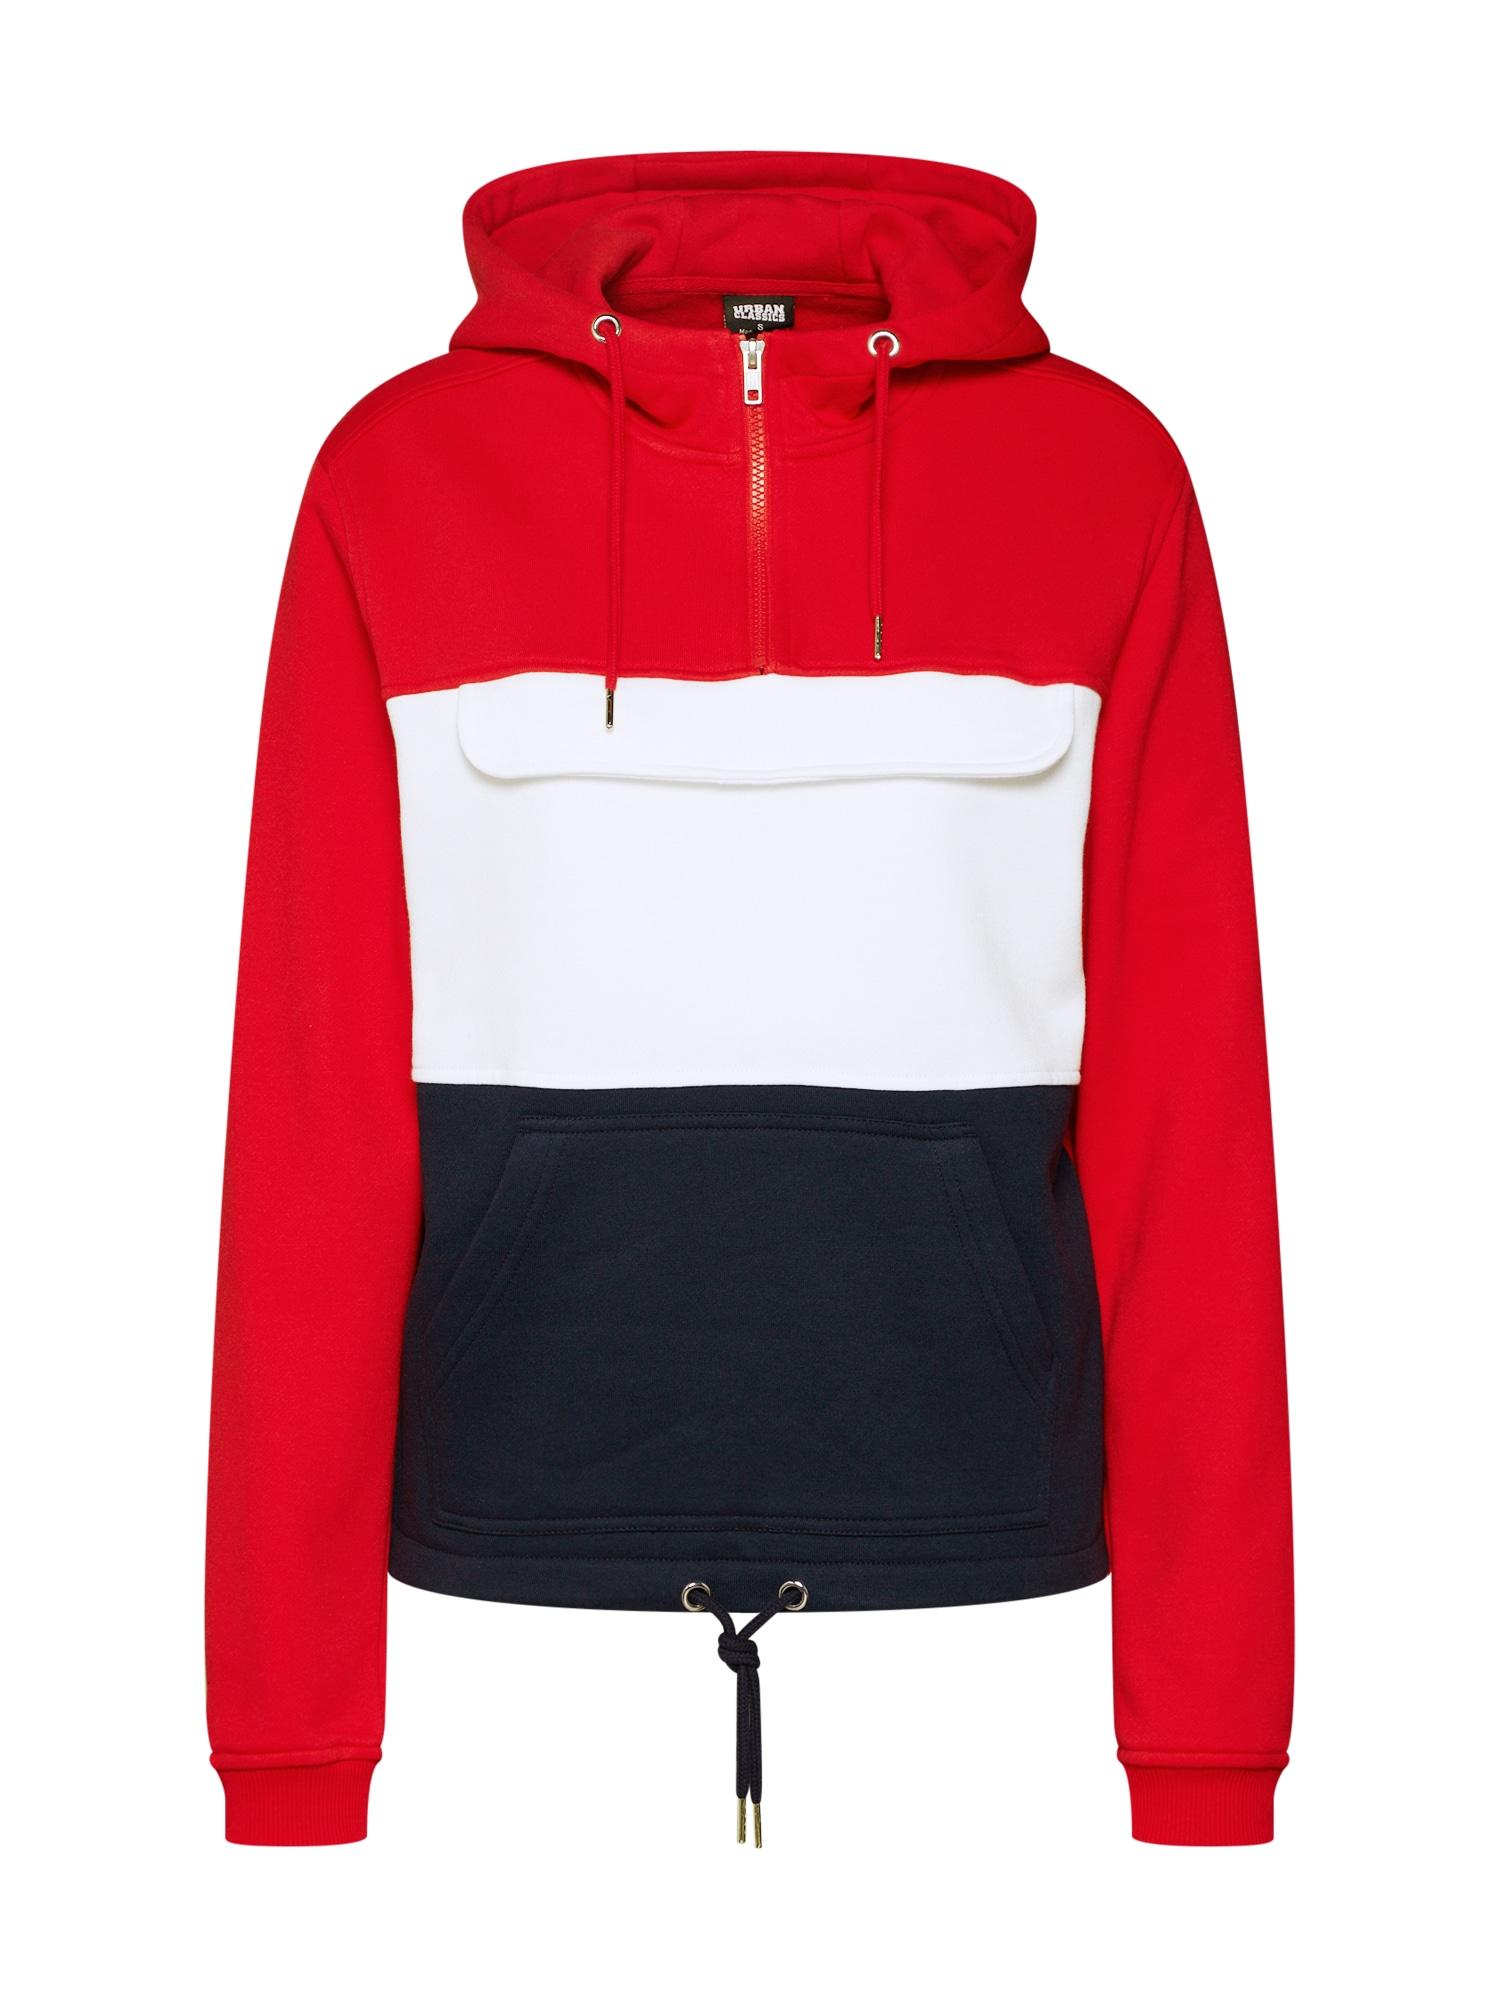 Mikina námořnická modř červená bílá Urban Classics